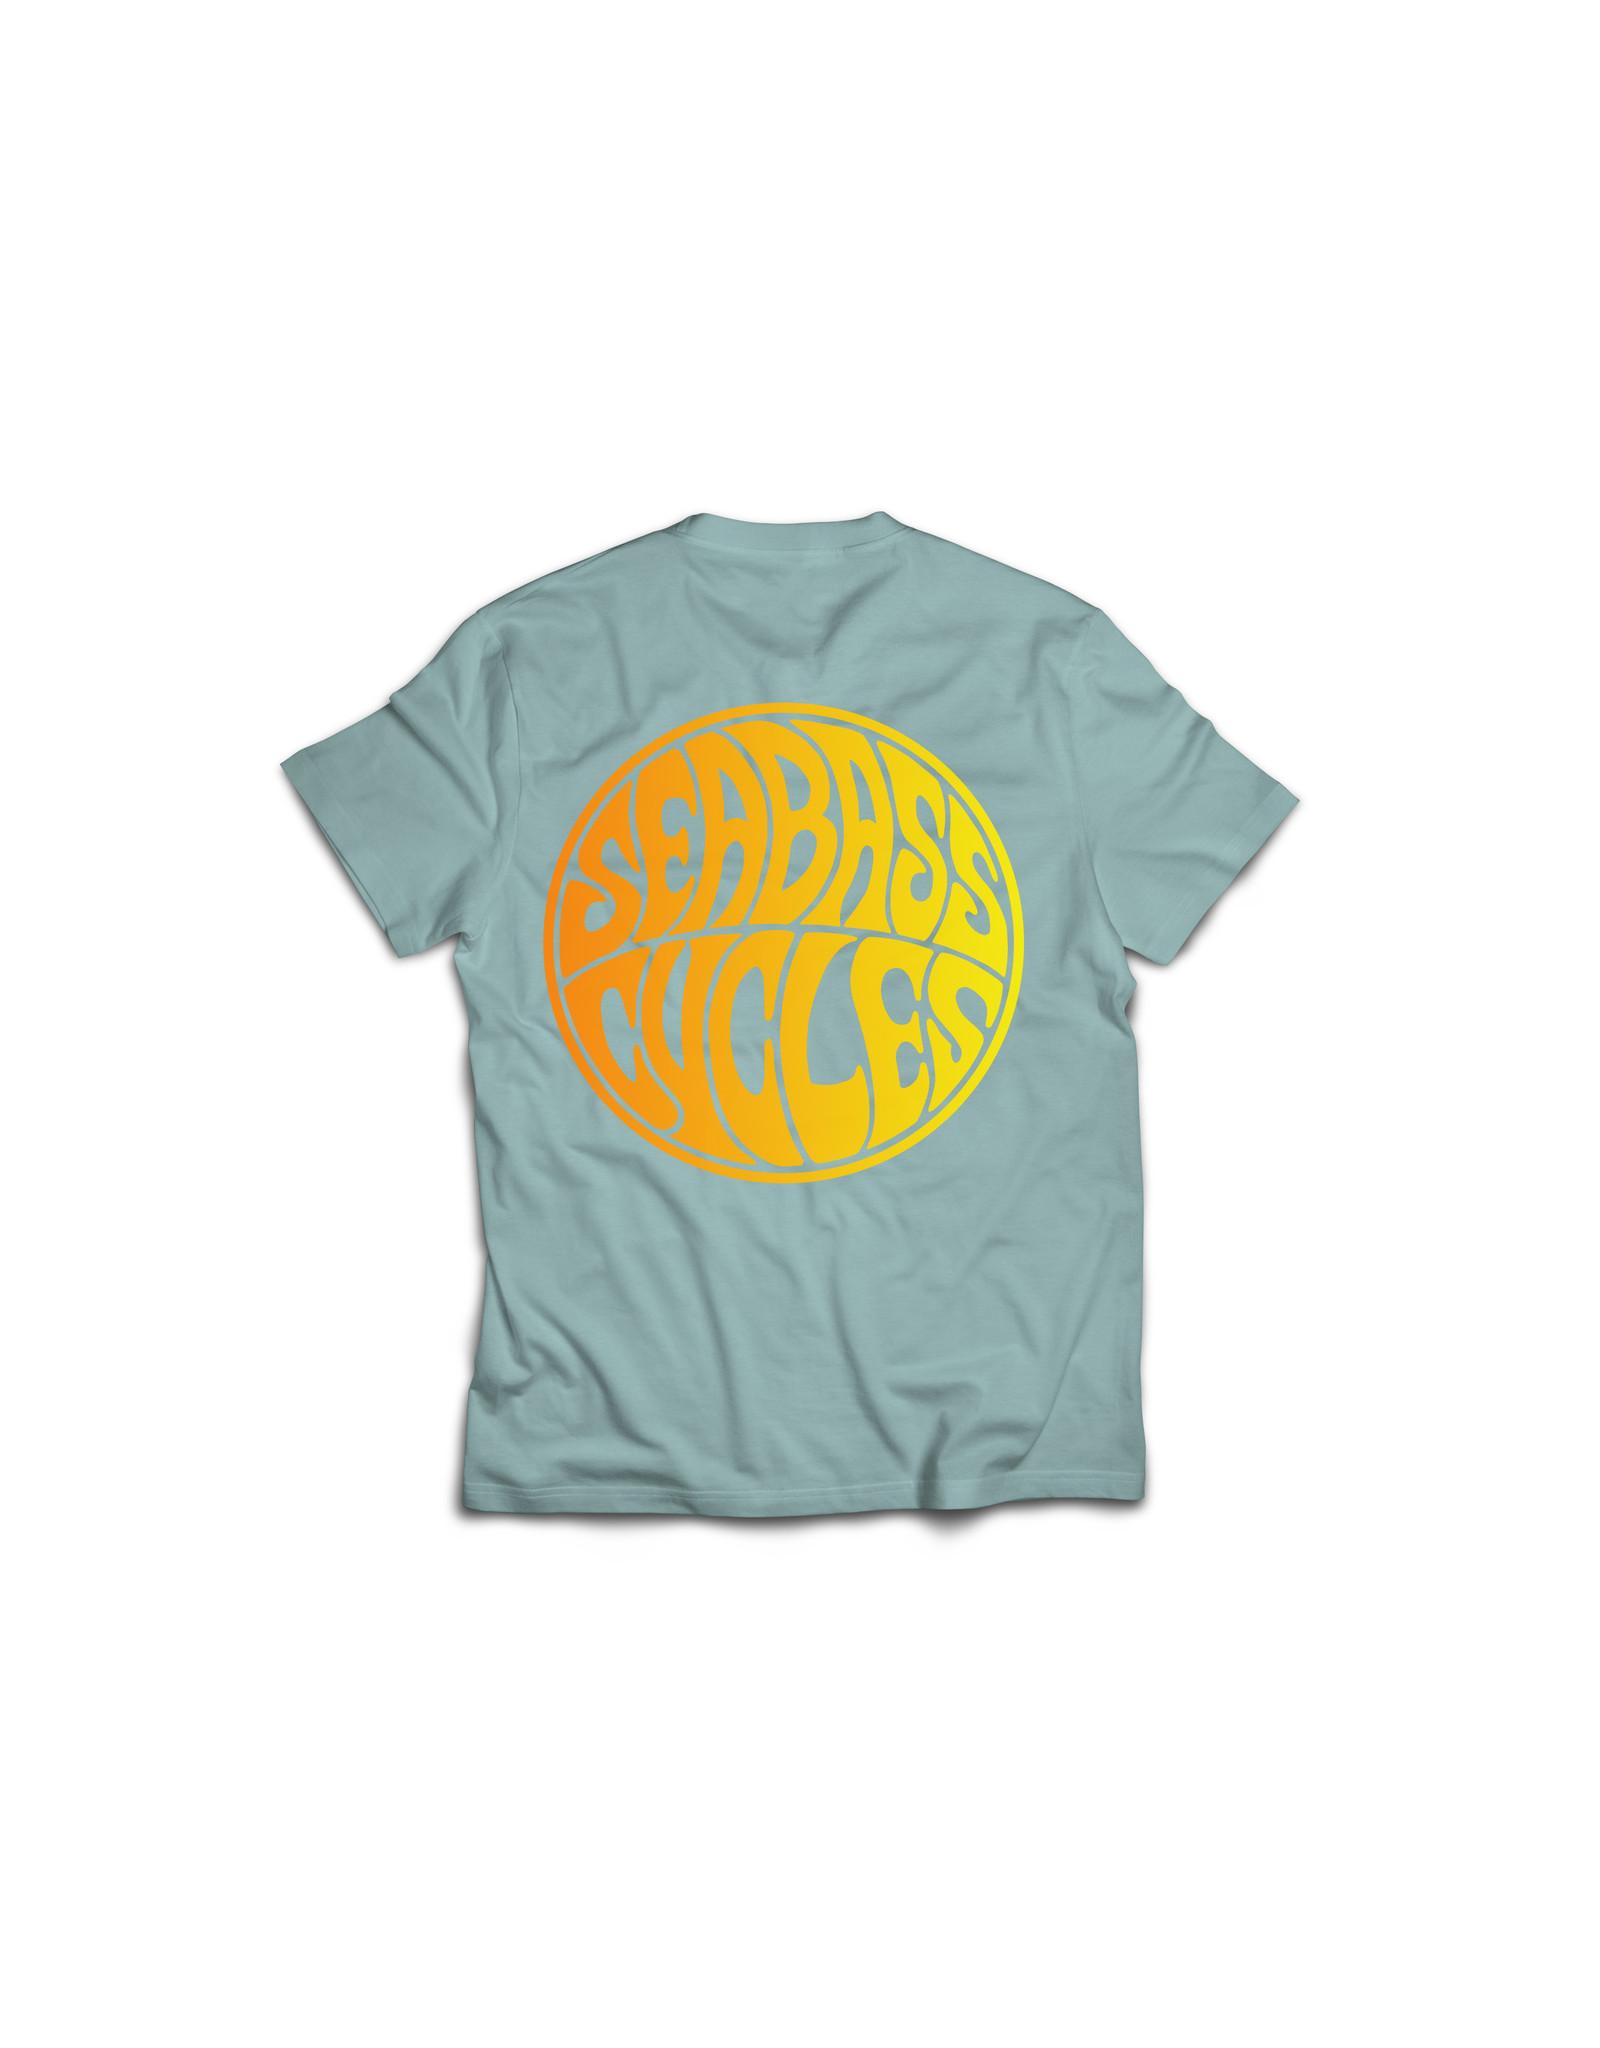 Seabass Cycles Seabass Cycles - Circle Logo Kids TShirt - Blue